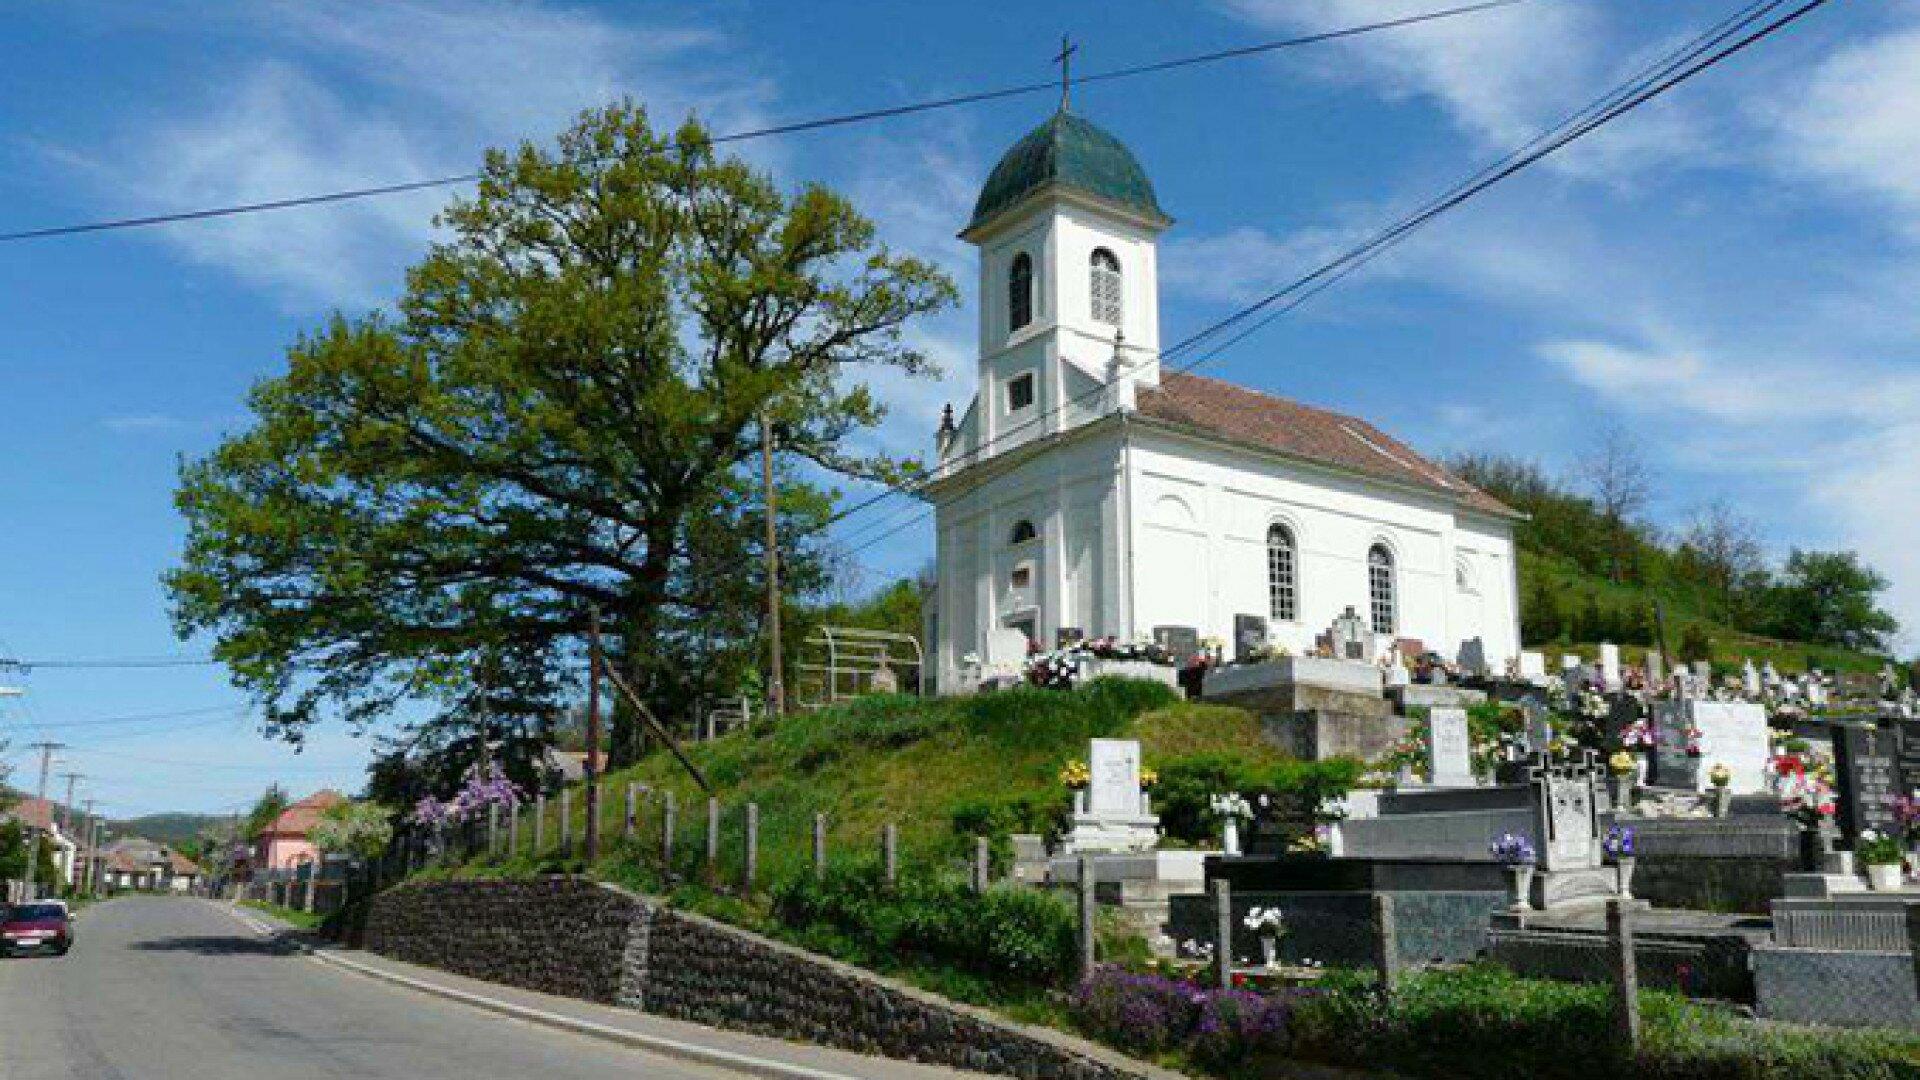 Turista Magazin Istenmezeje Lett A Legszebb Nevu Hazai Telepules